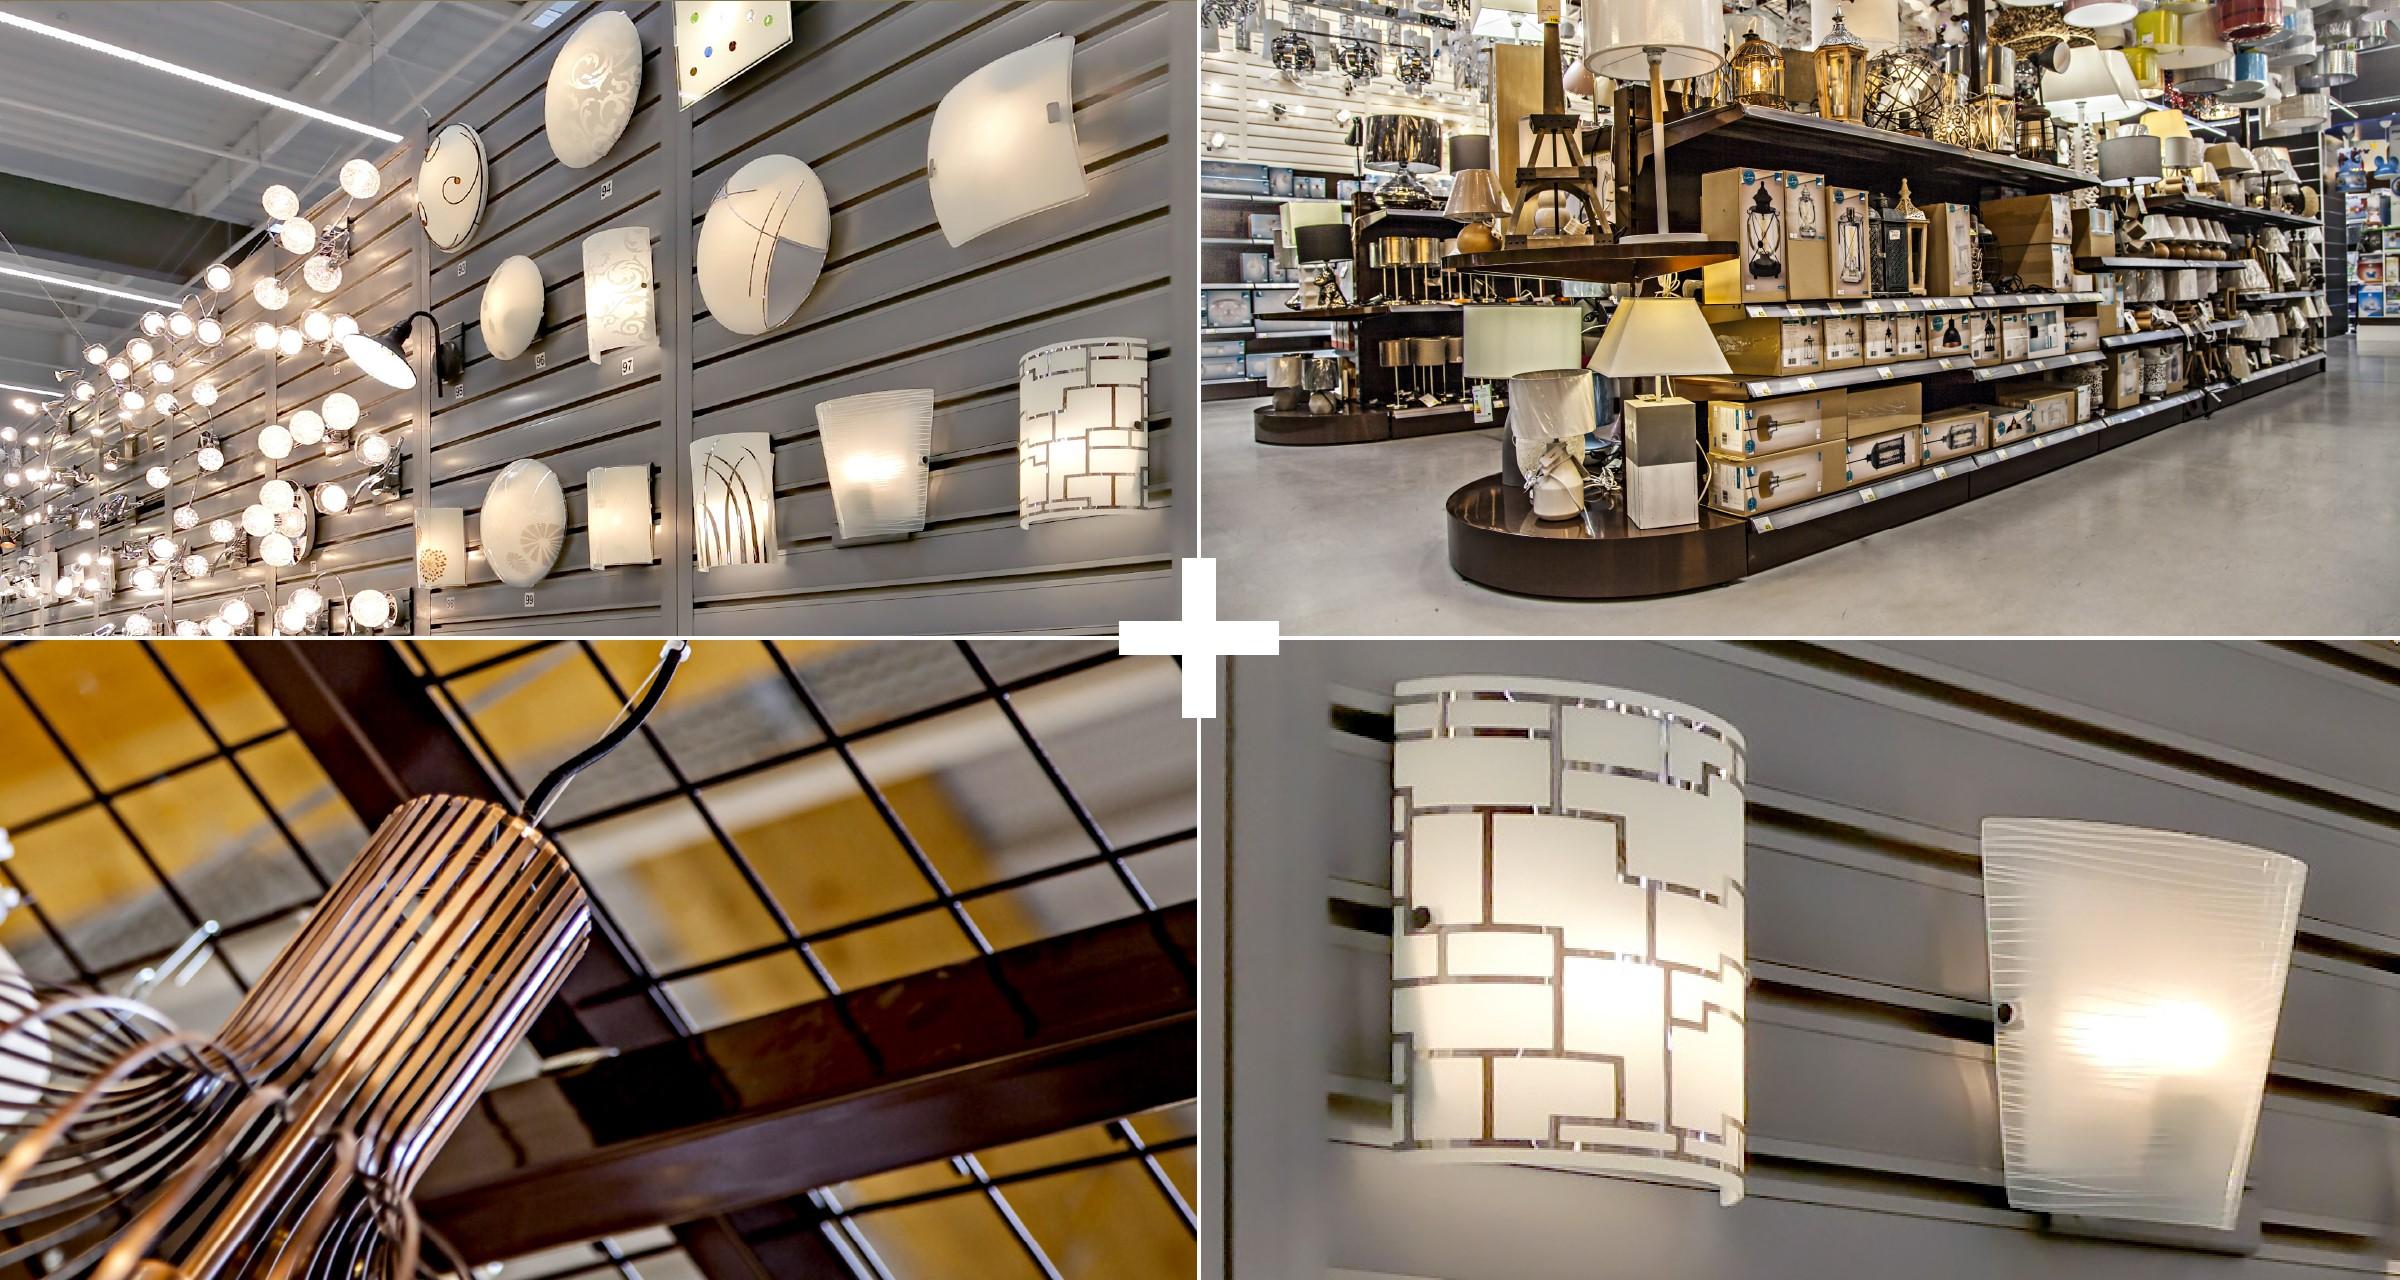 30 merveilleux magasin luminaire 92 zat3 luminaire salon. Black Bedroom Furniture Sets. Home Design Ideas